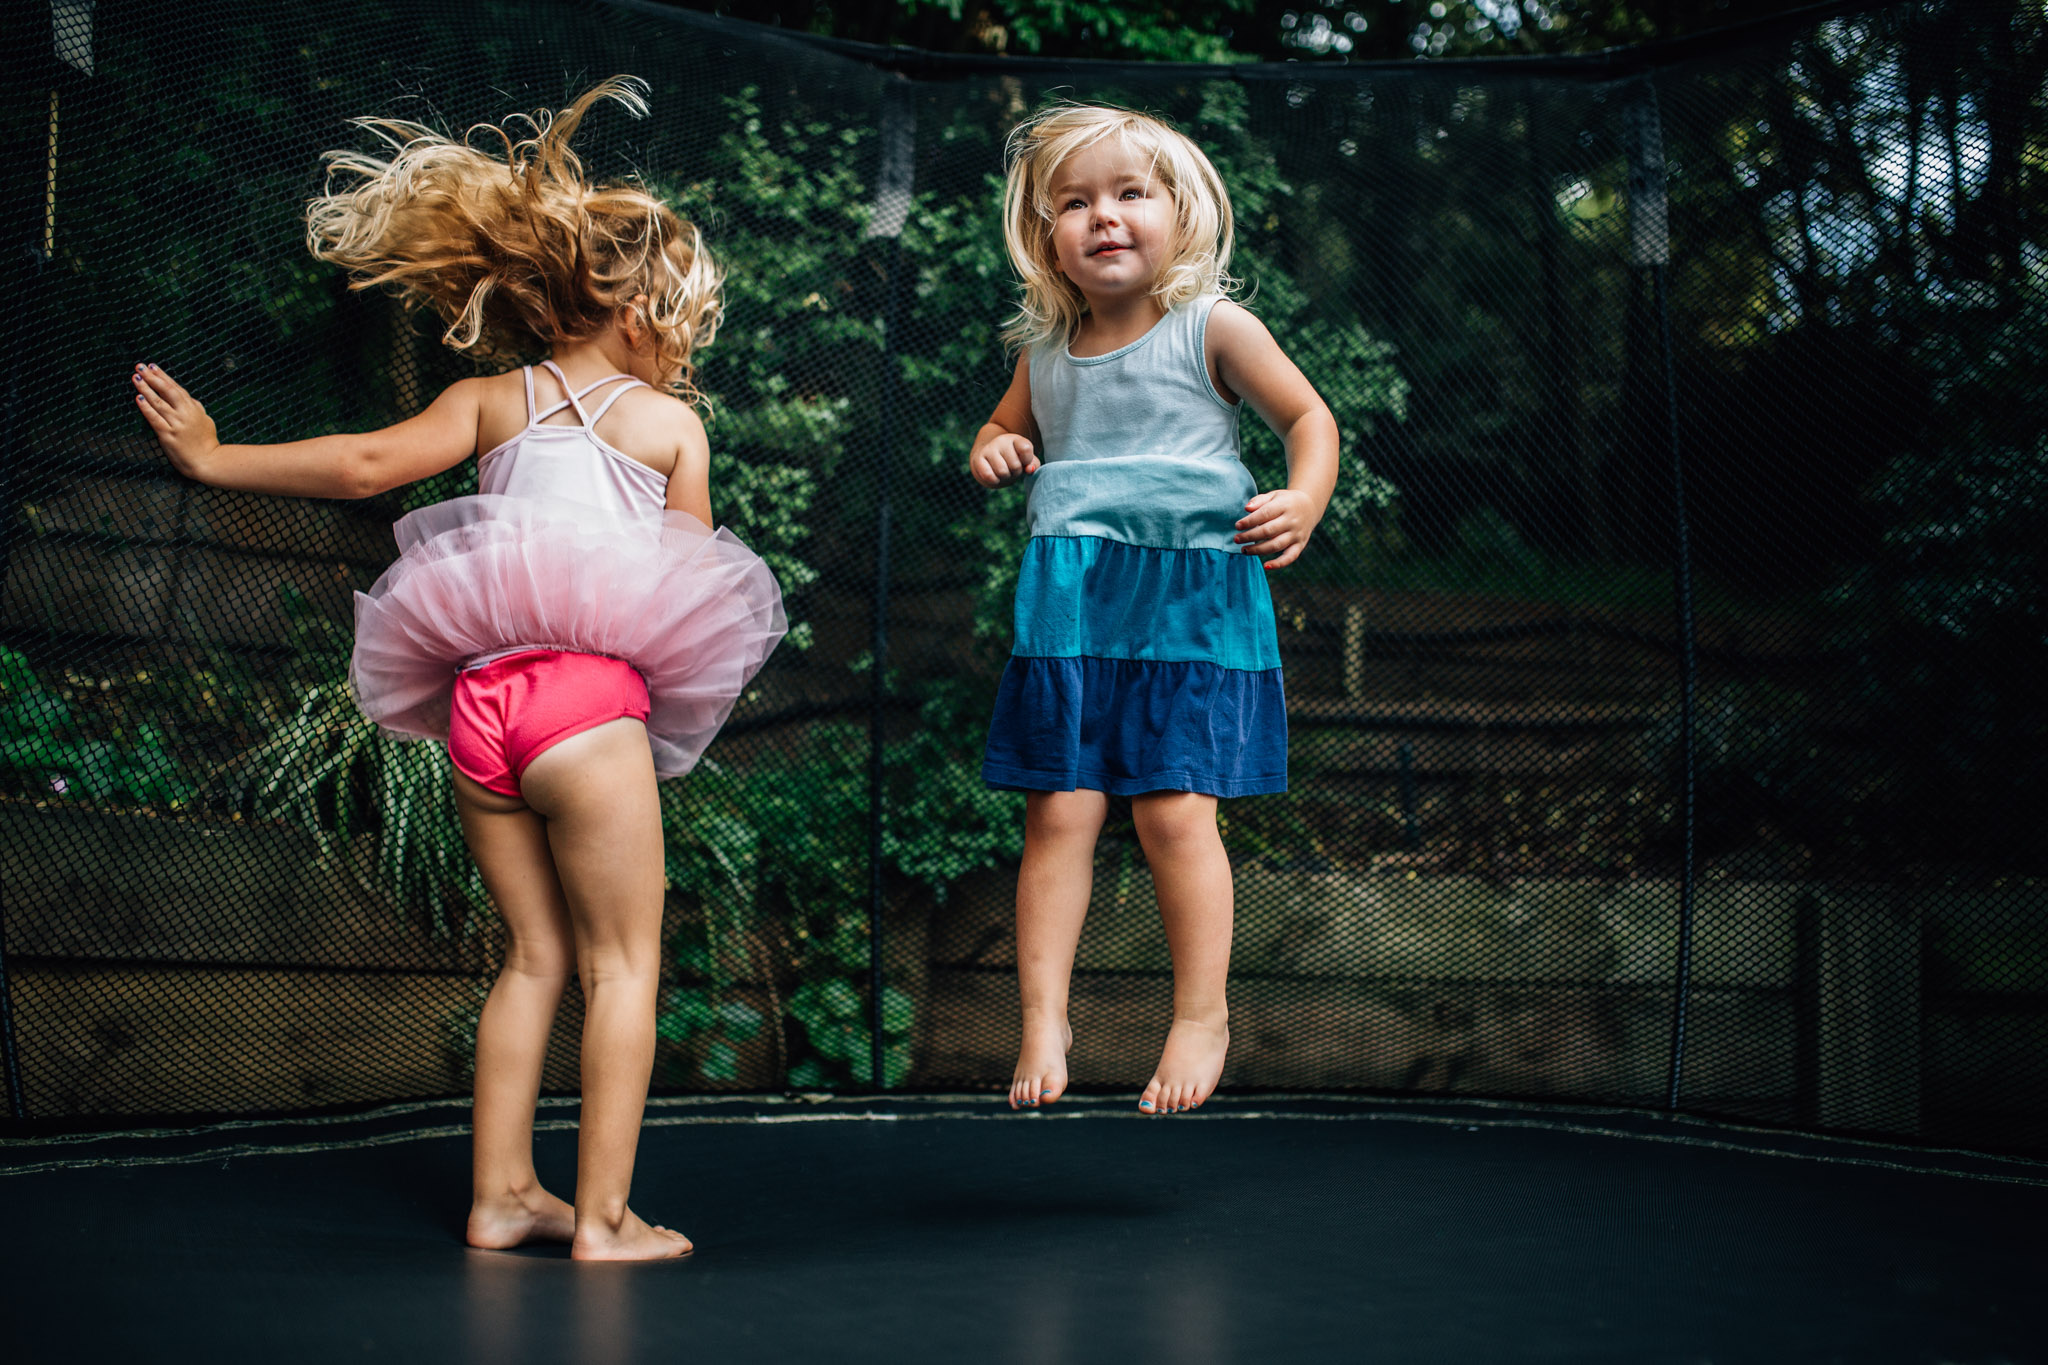 little-girls-jumping-together-on-trampoline (1 of 1).jpg